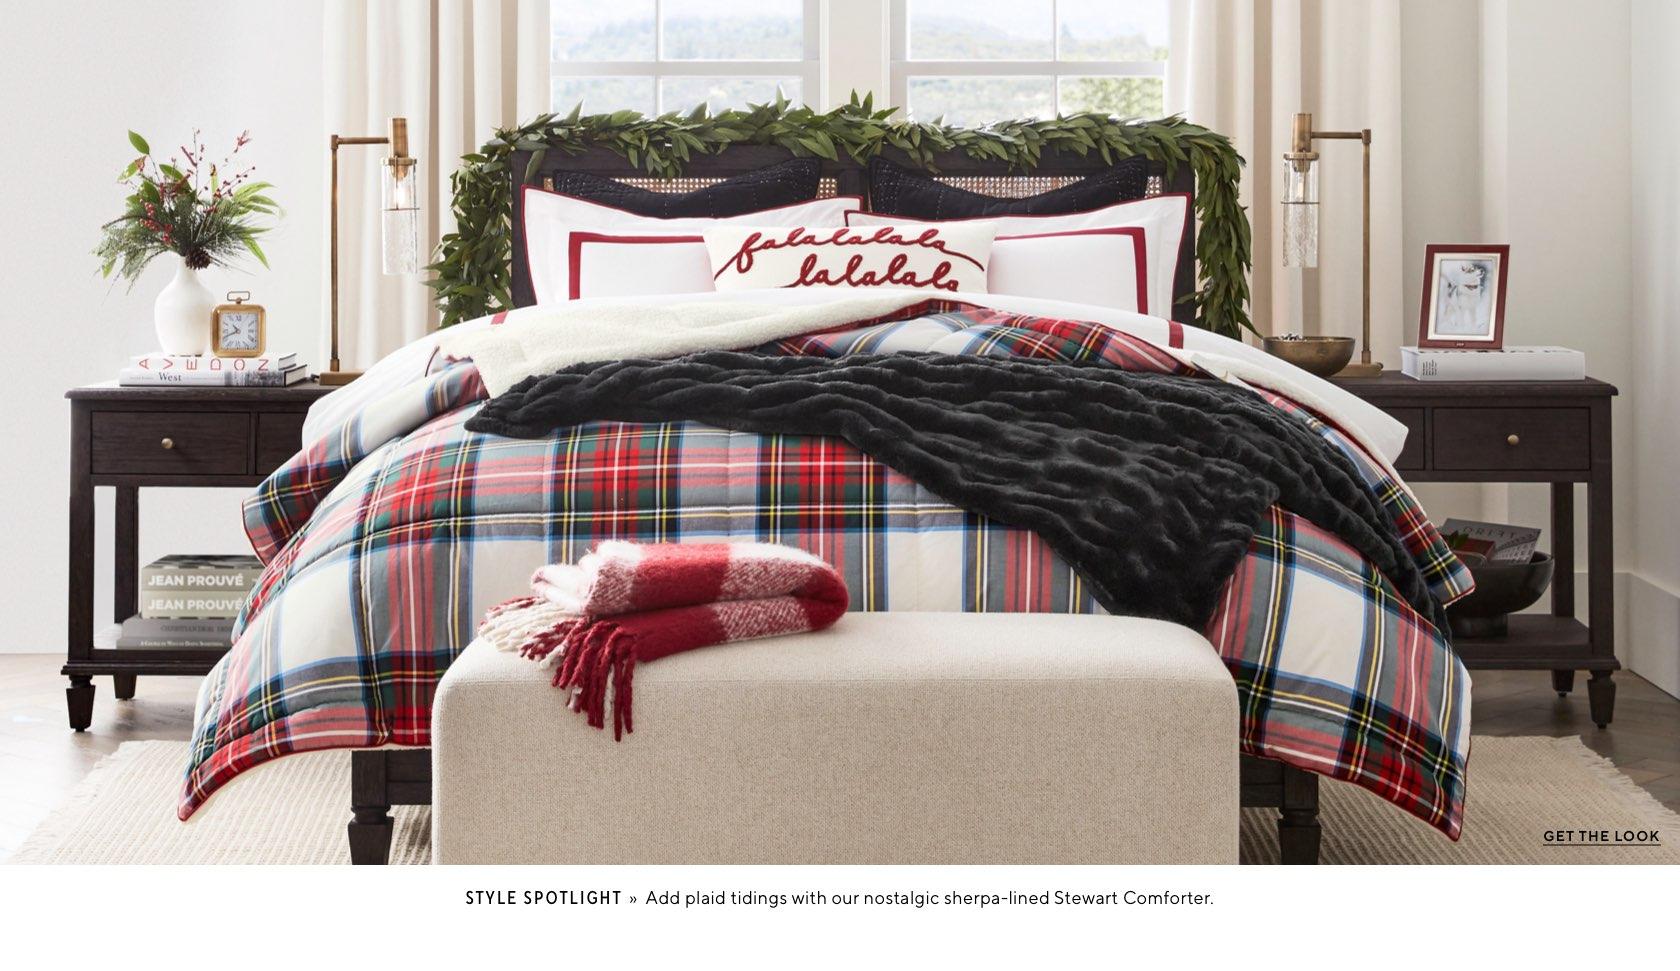 Red classic tartan bedding and Falalalala pillow - Pottery Barn #holidaybedroom